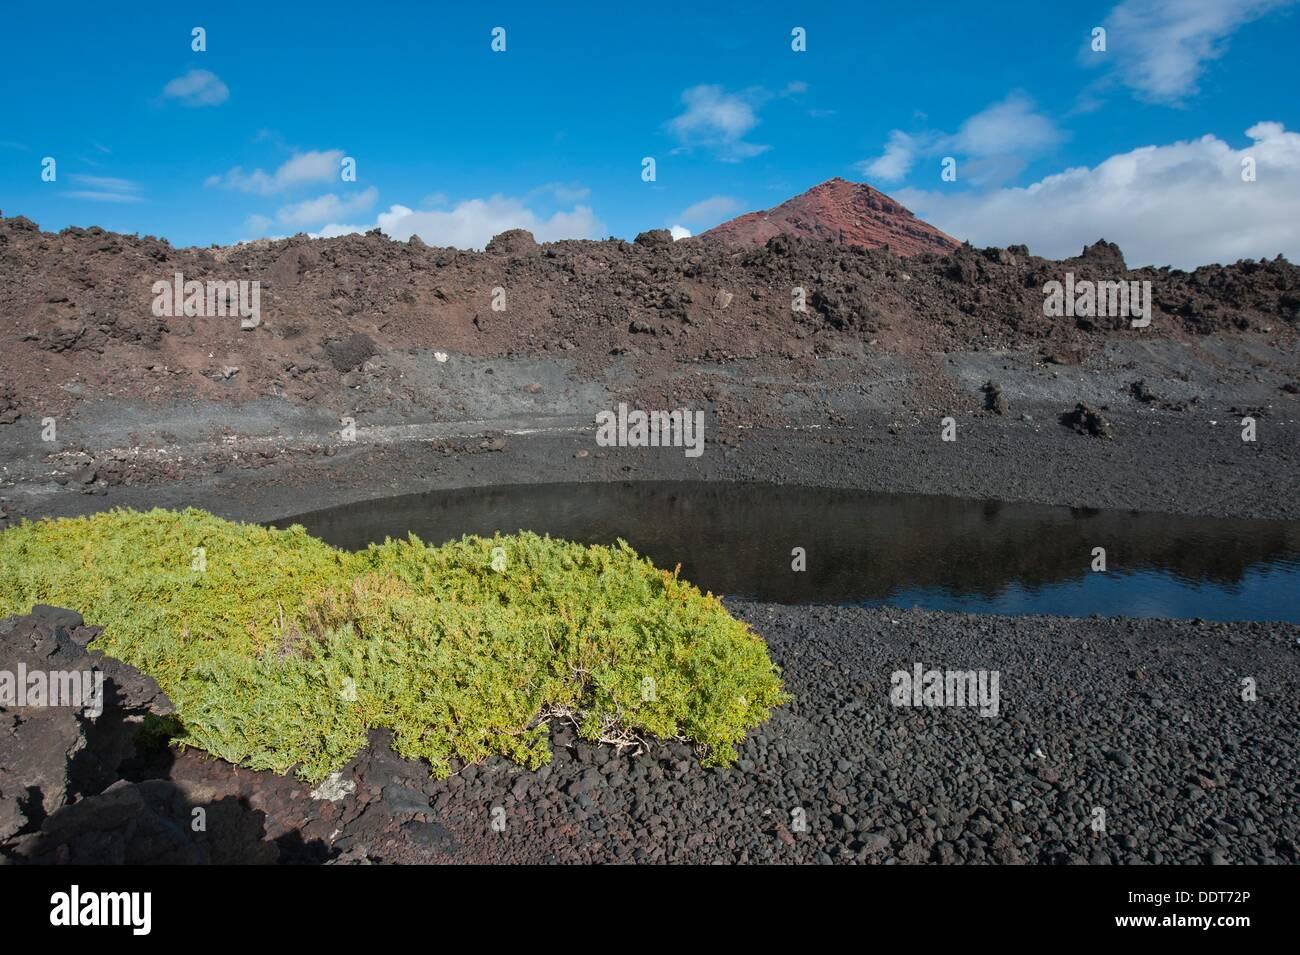 Coastal saltwater lagoon in black sand beach near Los Hervideros, Lanzarote, Canary Islands, Spain. - Stock Image